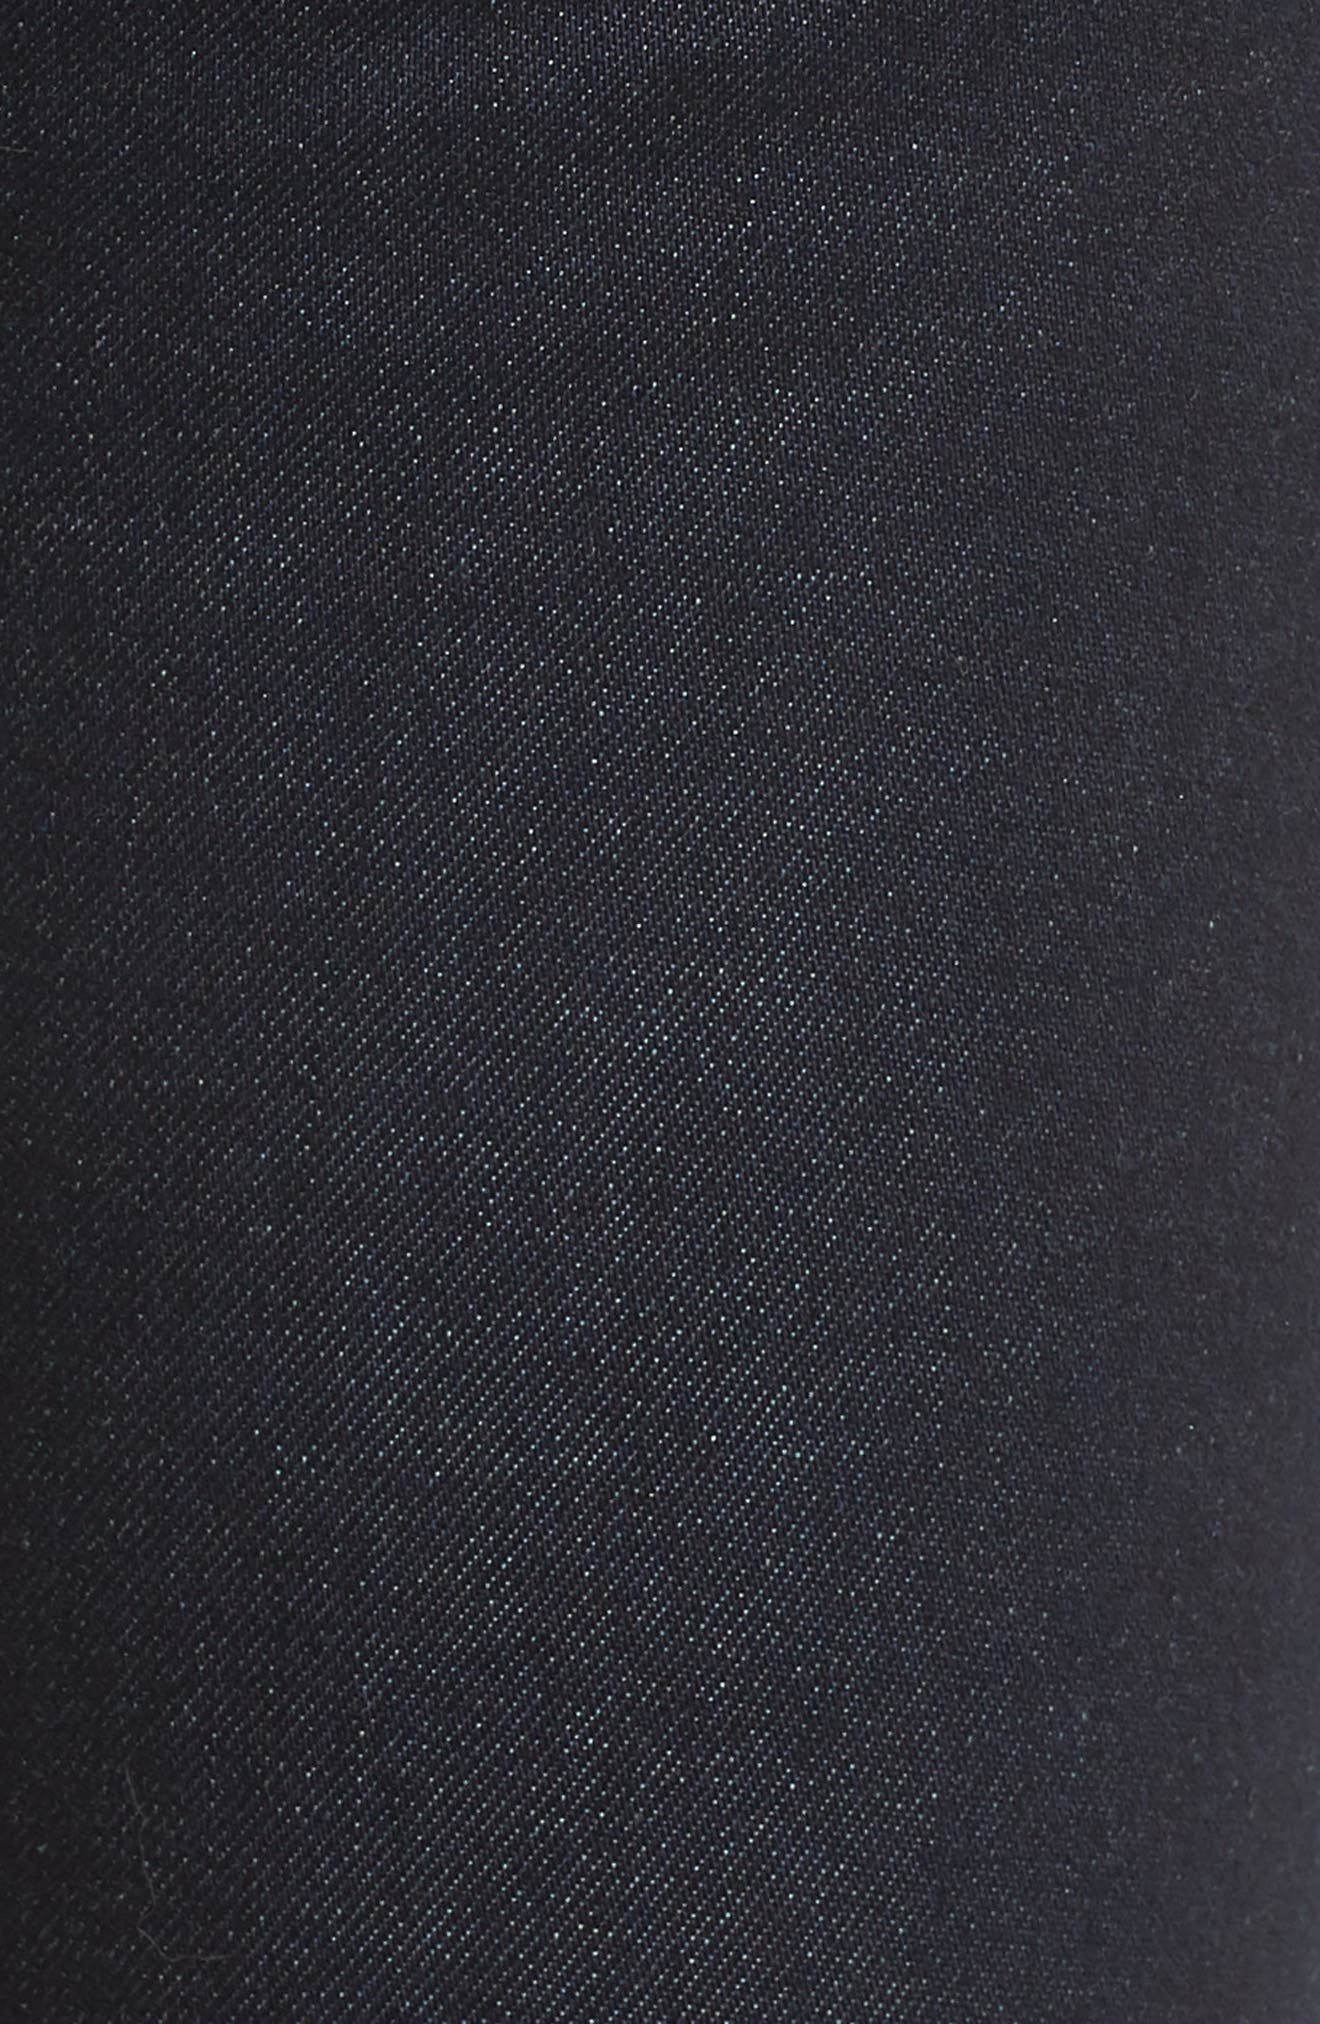 Nico Super Skinny Jeans,                             Alternate thumbnail 6, color,                             SUNSET BLVD